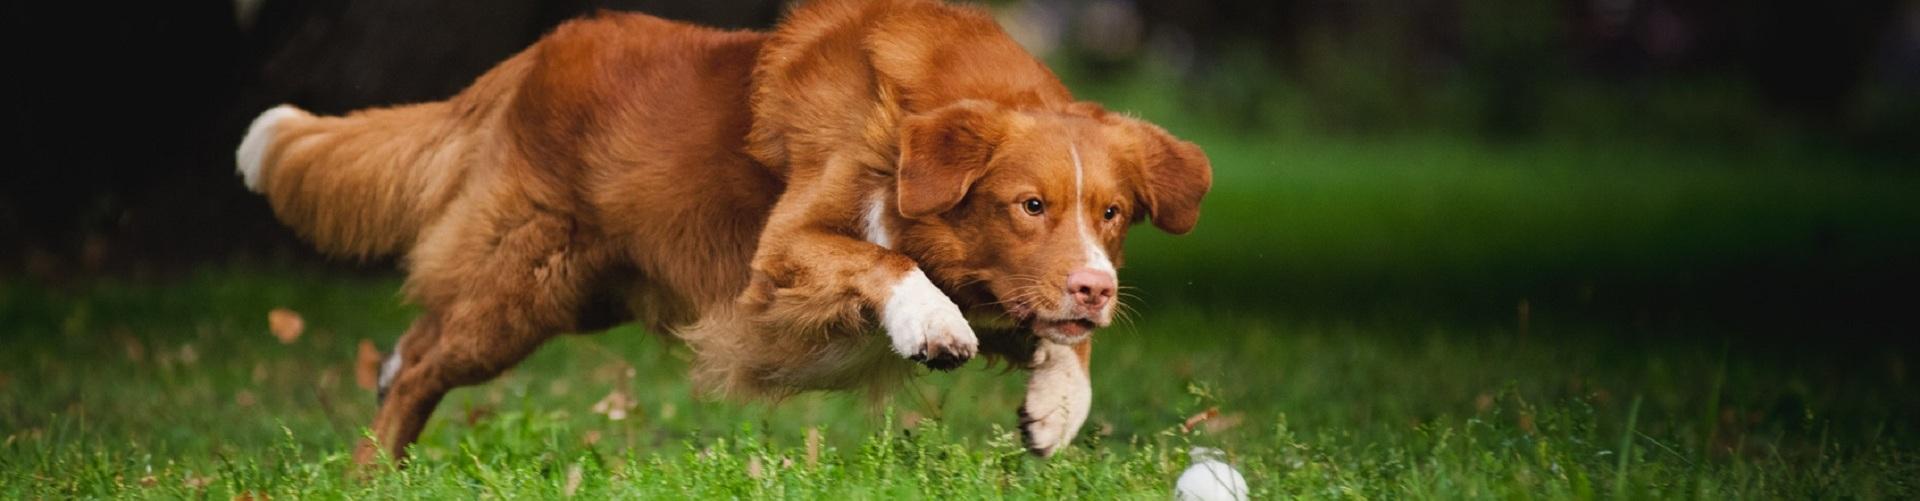 Nahrungsergänzung für Hunde bei Greenheart Austria